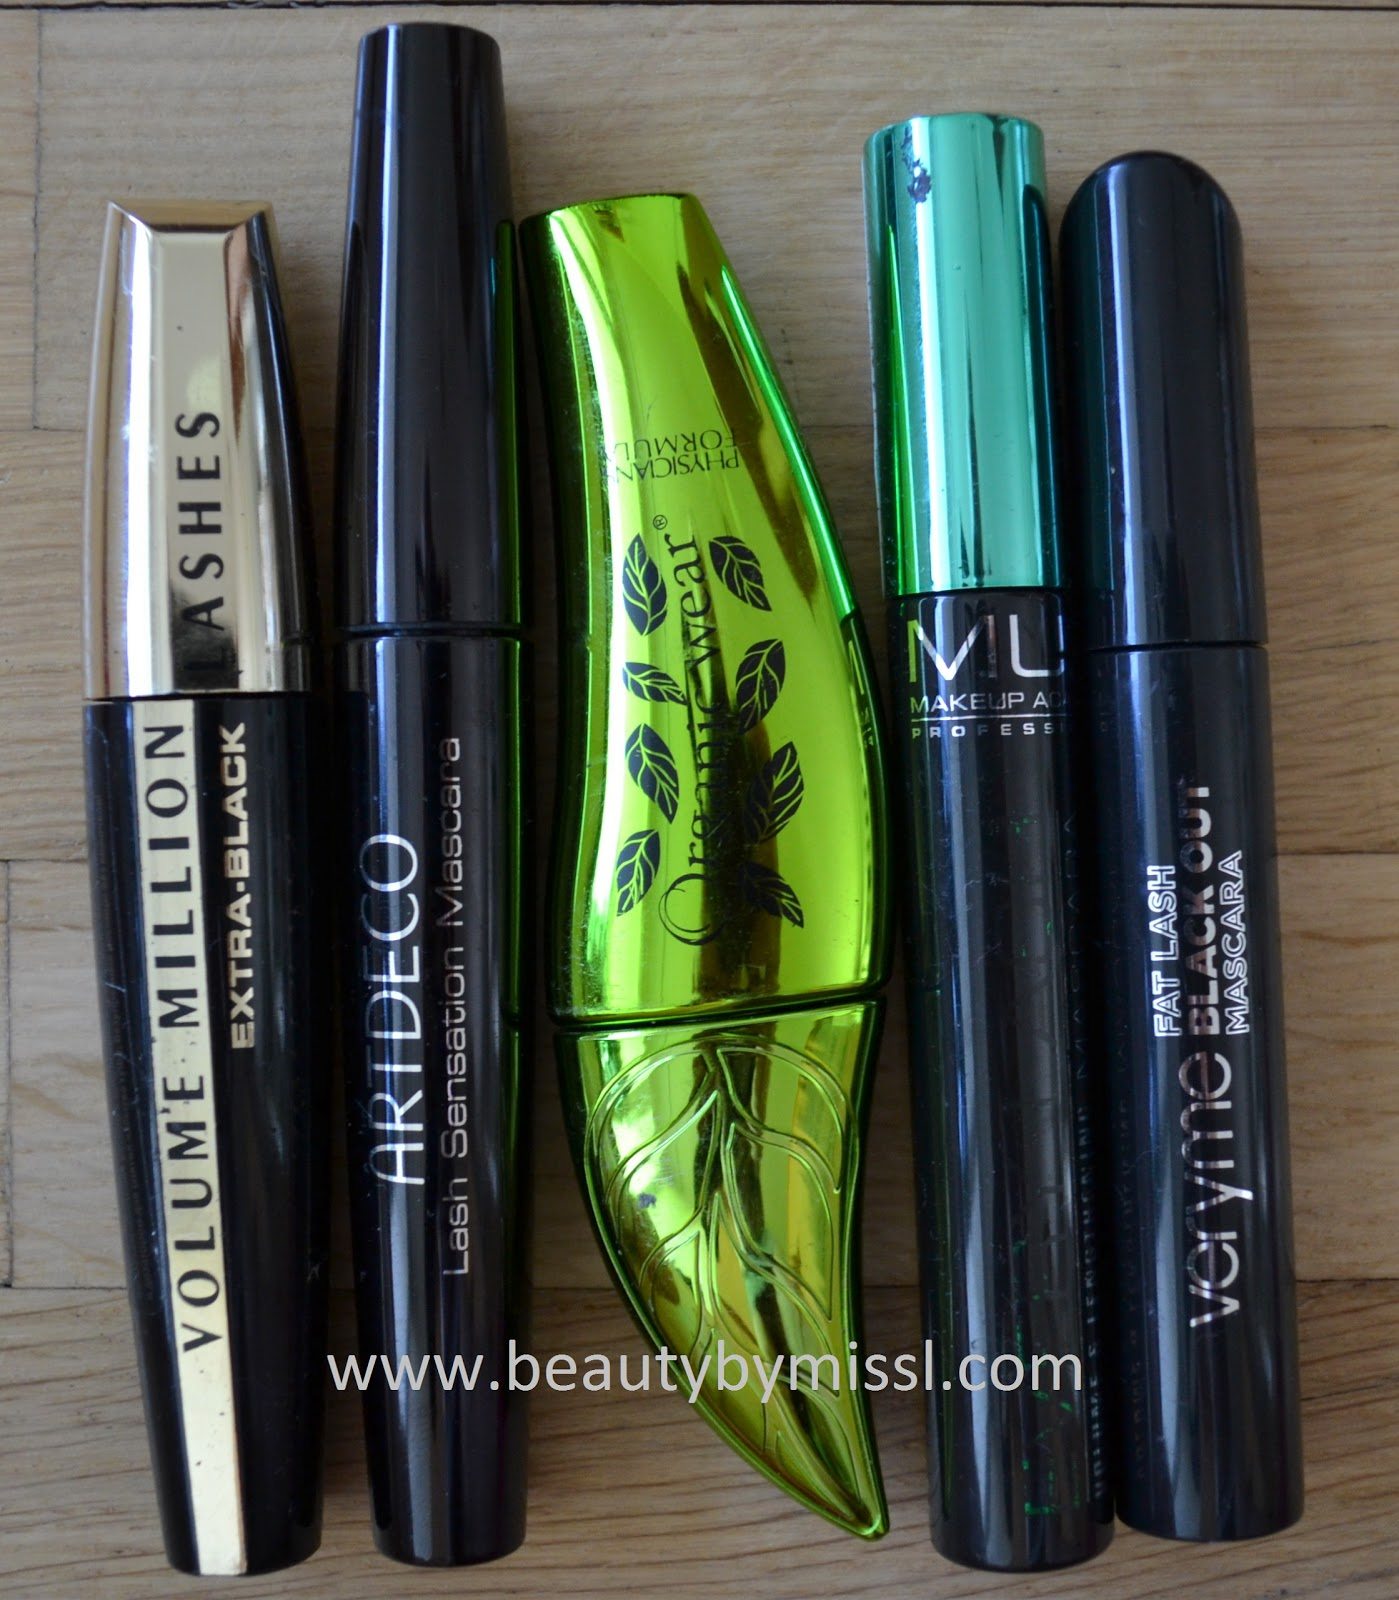 L´Oreal, Artdeco, Physicians Formula, MUA Makeup Academy, Oriflame